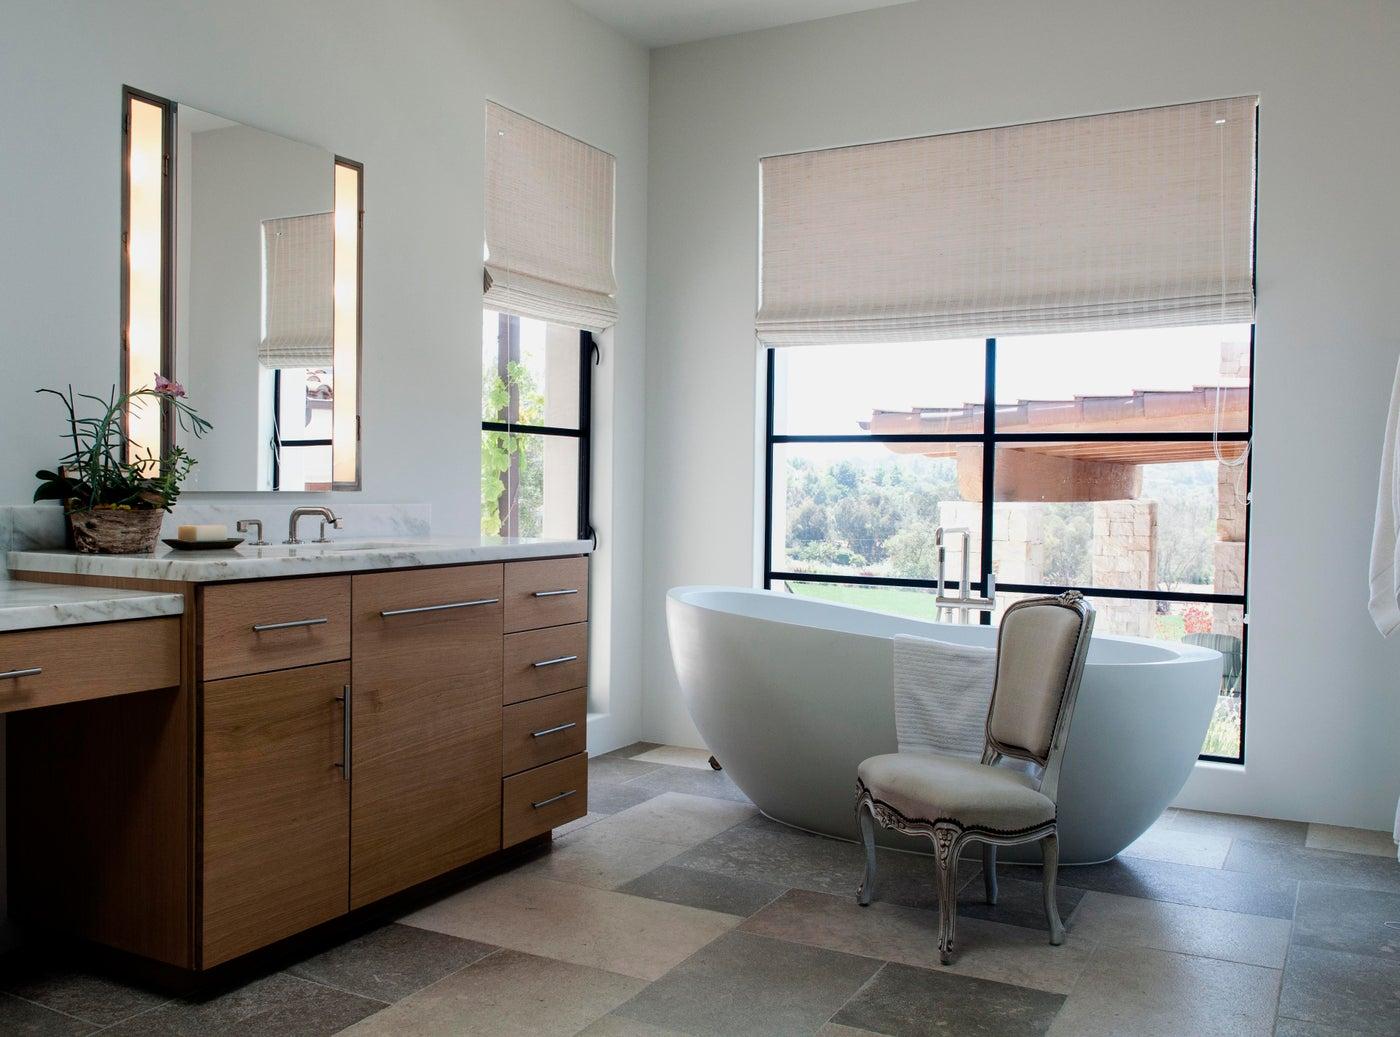 Modern meets Mediterranean in this Rancho Santa Fe master bath, with its sleek Waterworks freestanding tub and antique limestone floor.